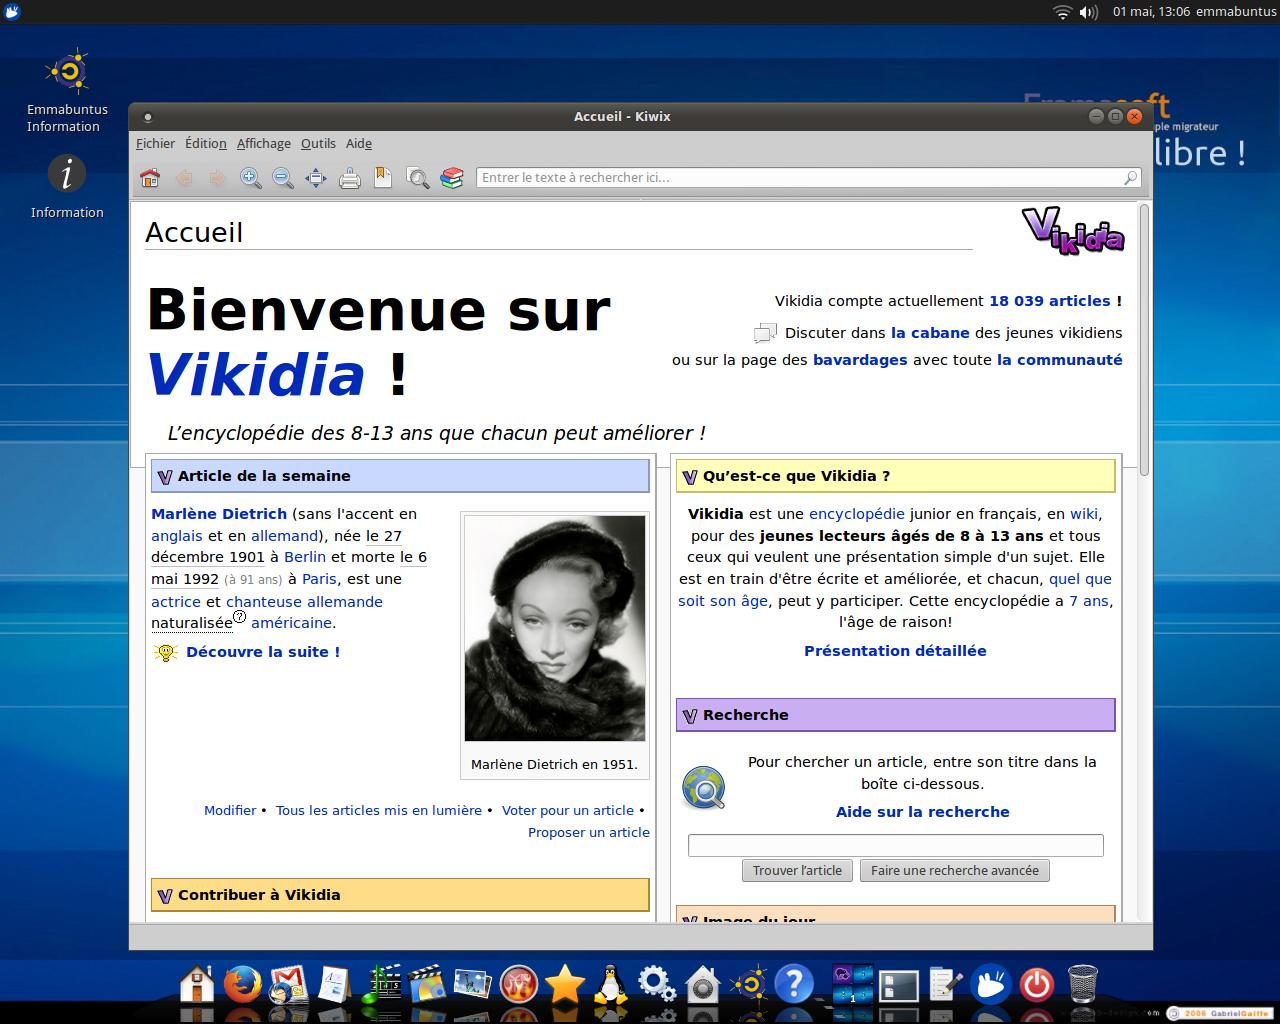 Nom : 36-Kiwix_accueil_vikidia.png Affichages : 436 Taille : 435,7 Ko